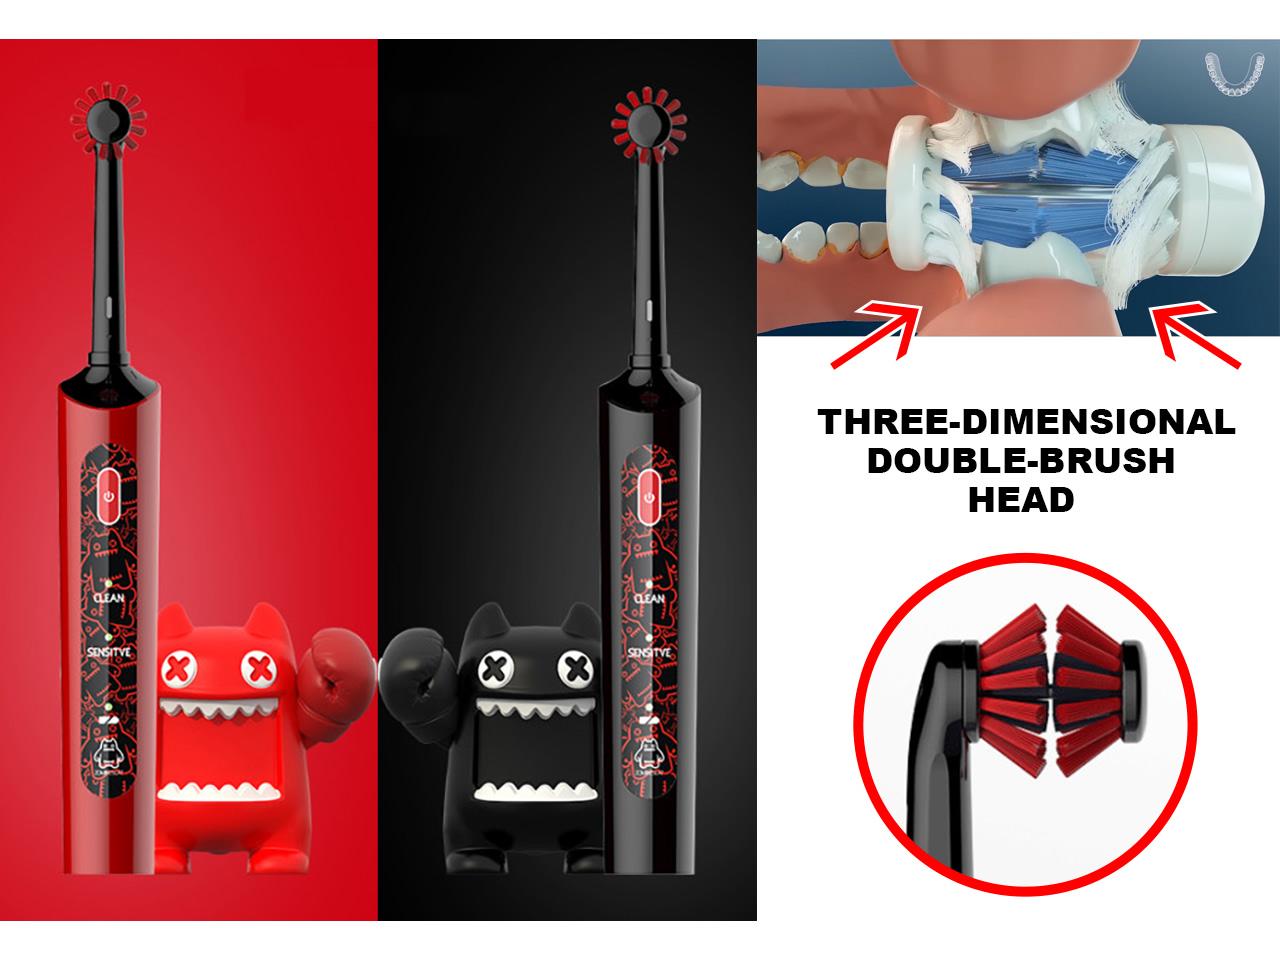 Представлена первая двойная зубная щетка Smart 3D